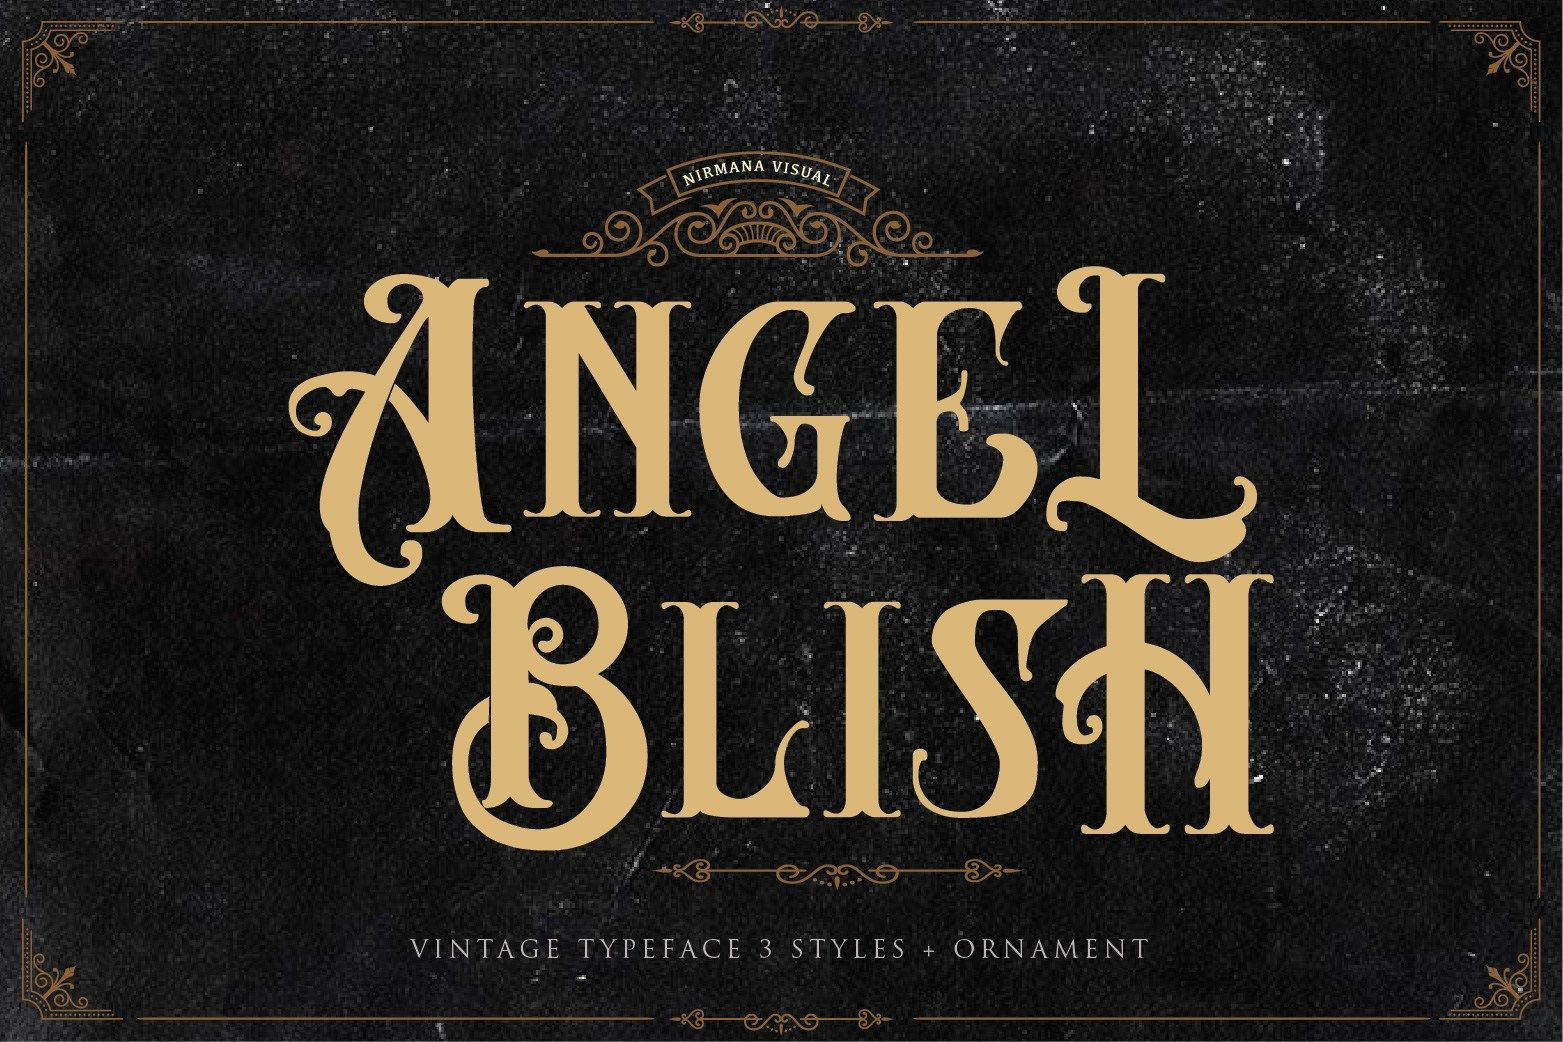 Angel Blish Vintage Font Free Design Resources Typeface Vintage Fonts Classy Fonts